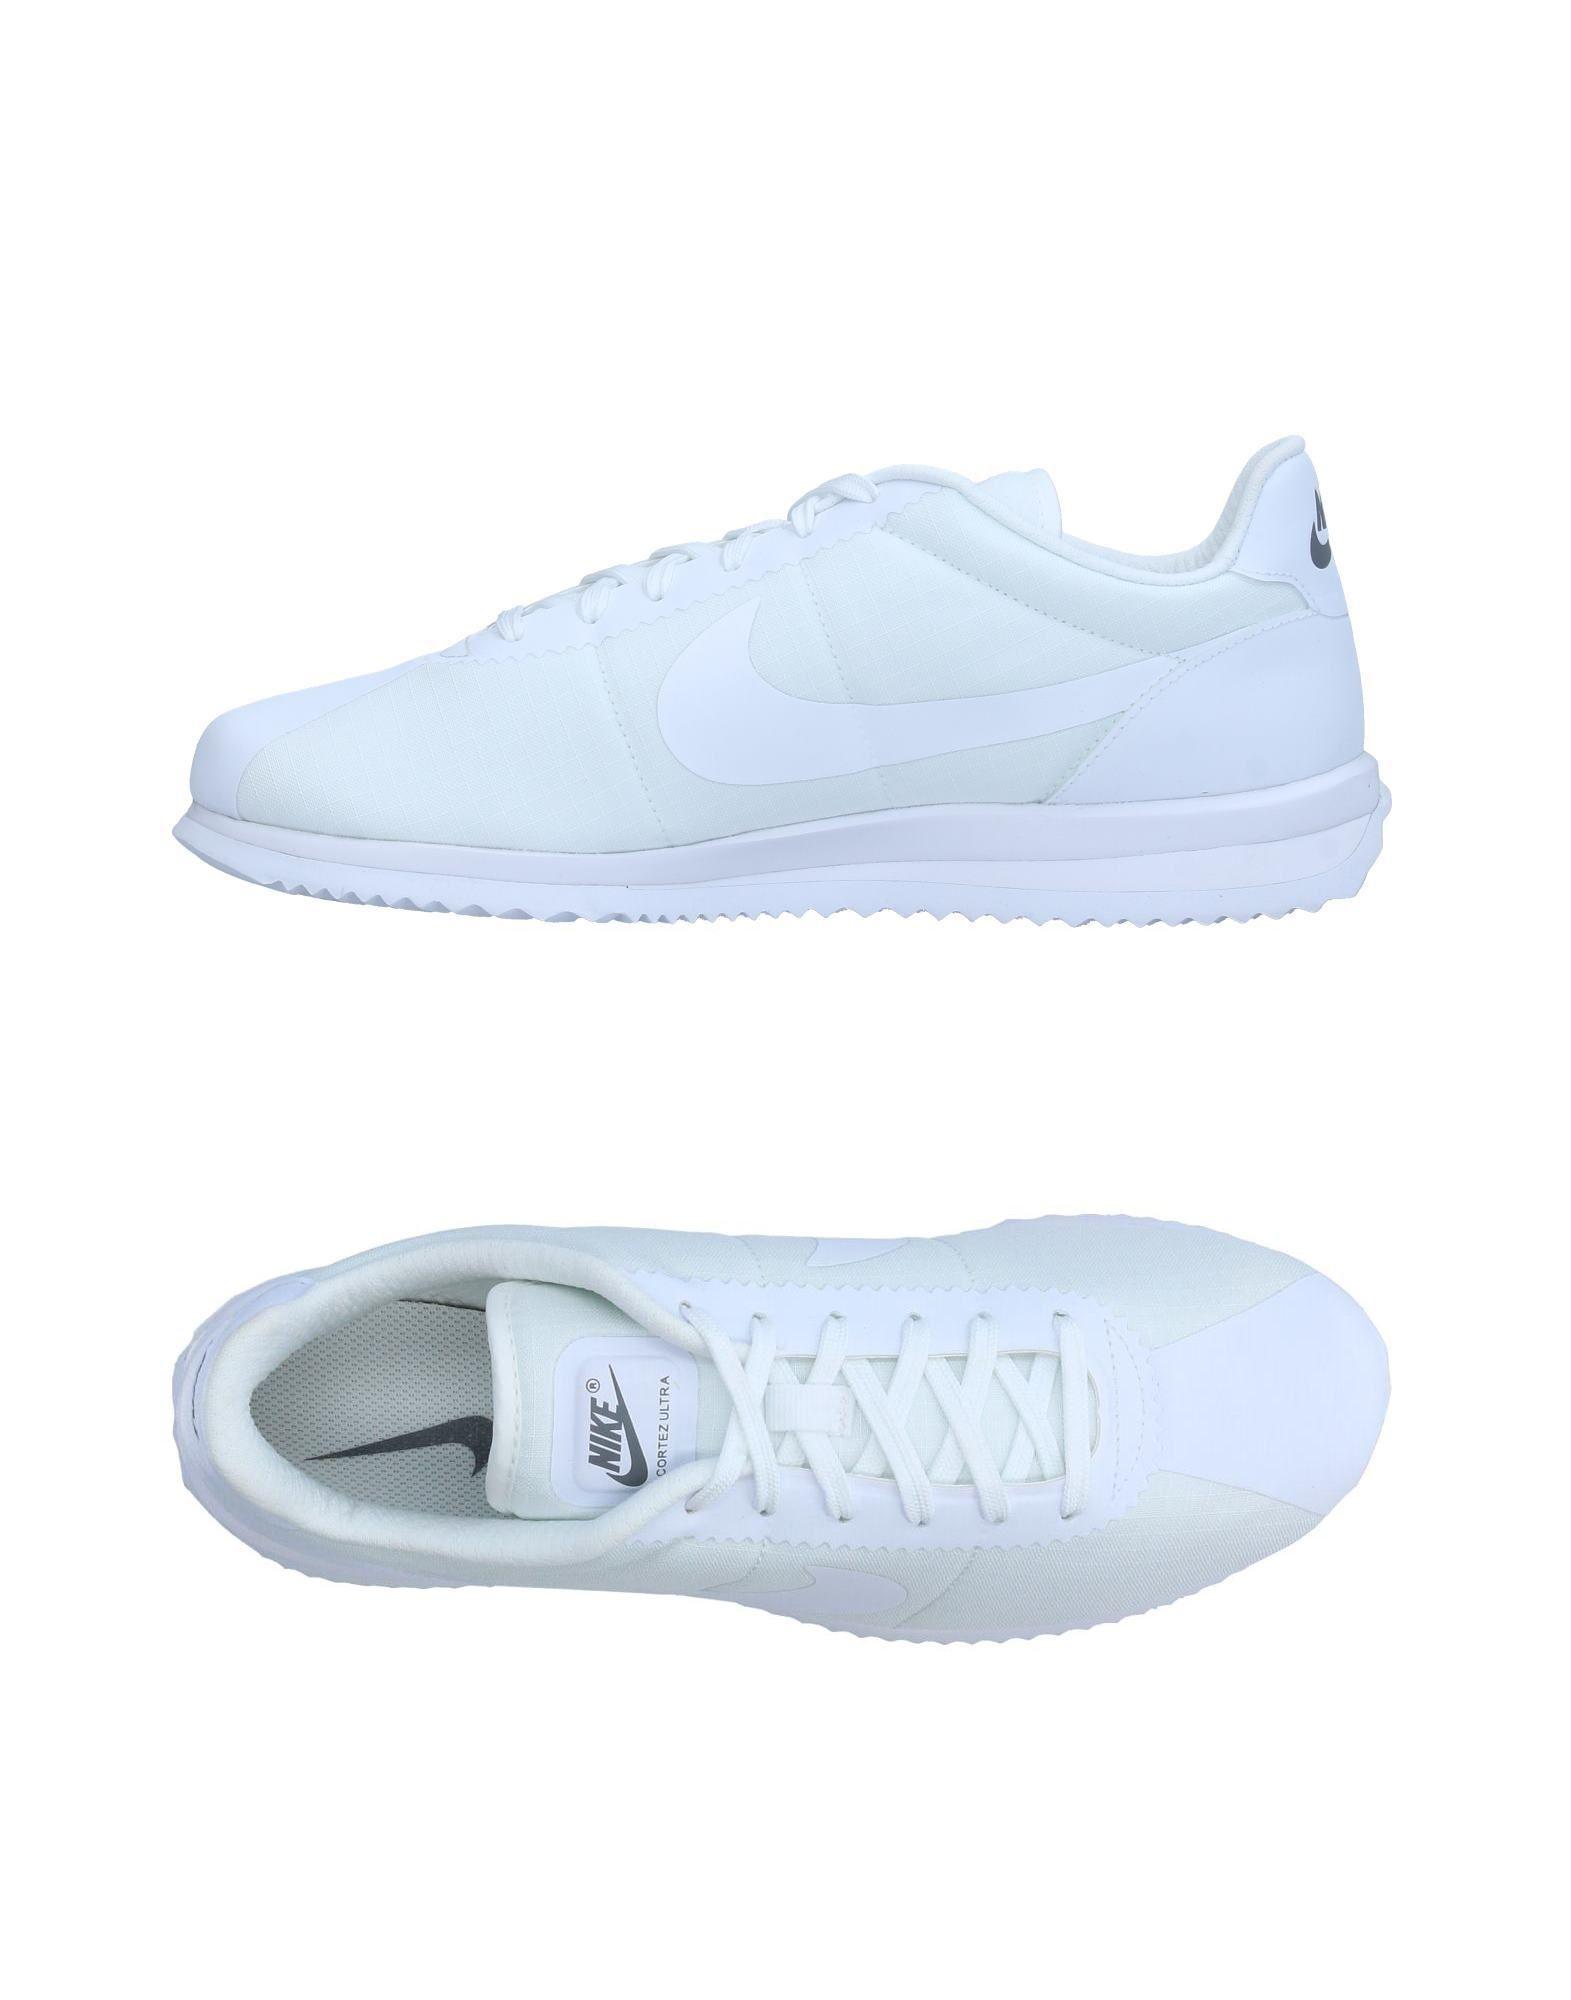 Moda Uomo Scarpe da Ginnastica Nike Uomo Moda - 11338655UE 42865f